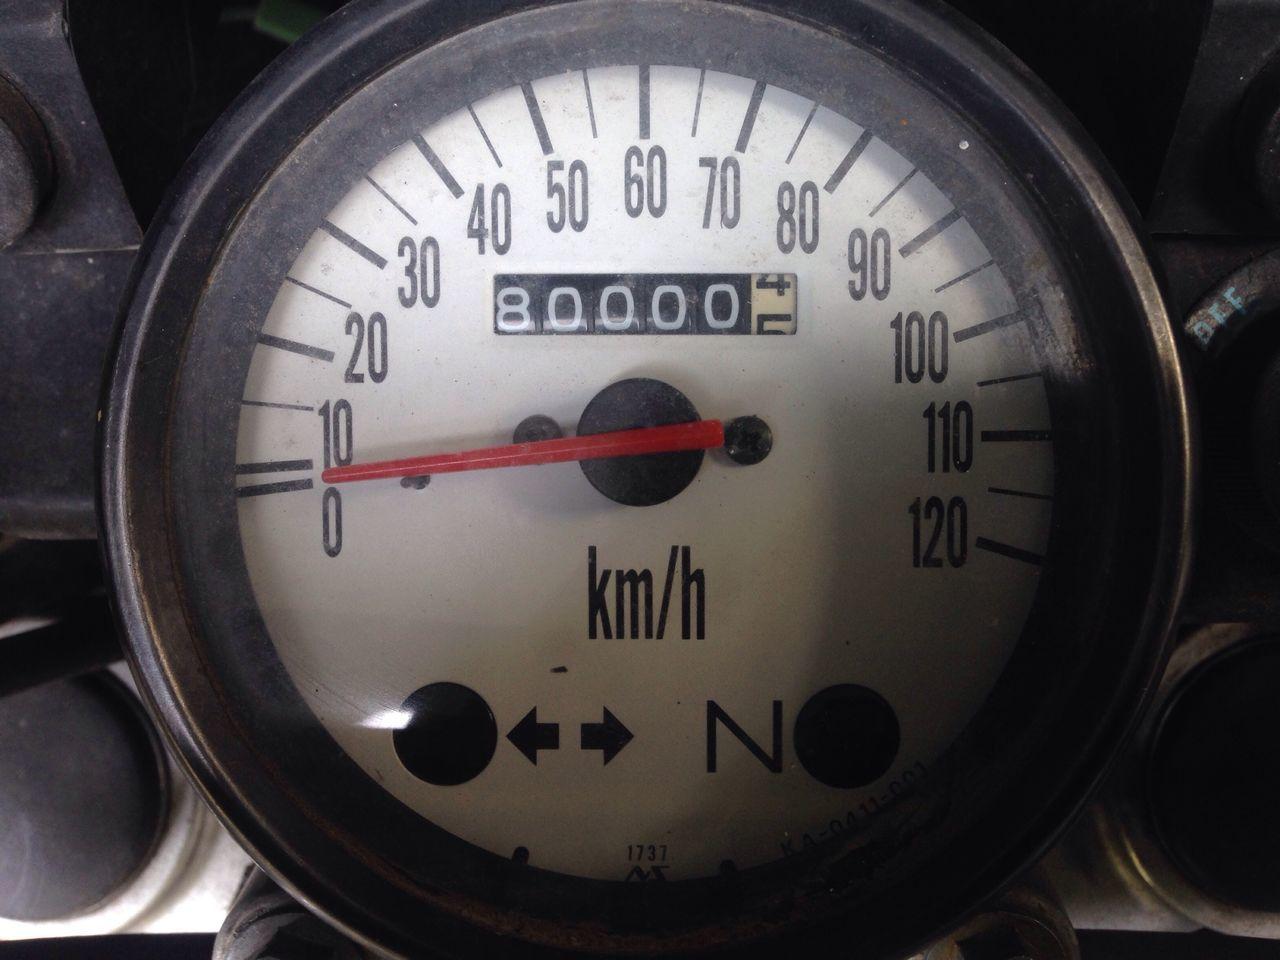 Gauge Number No People Speedometer Clock Face Accuracy Close-up Day Meter - Instrument Of Measurement Miles Away Kilometers